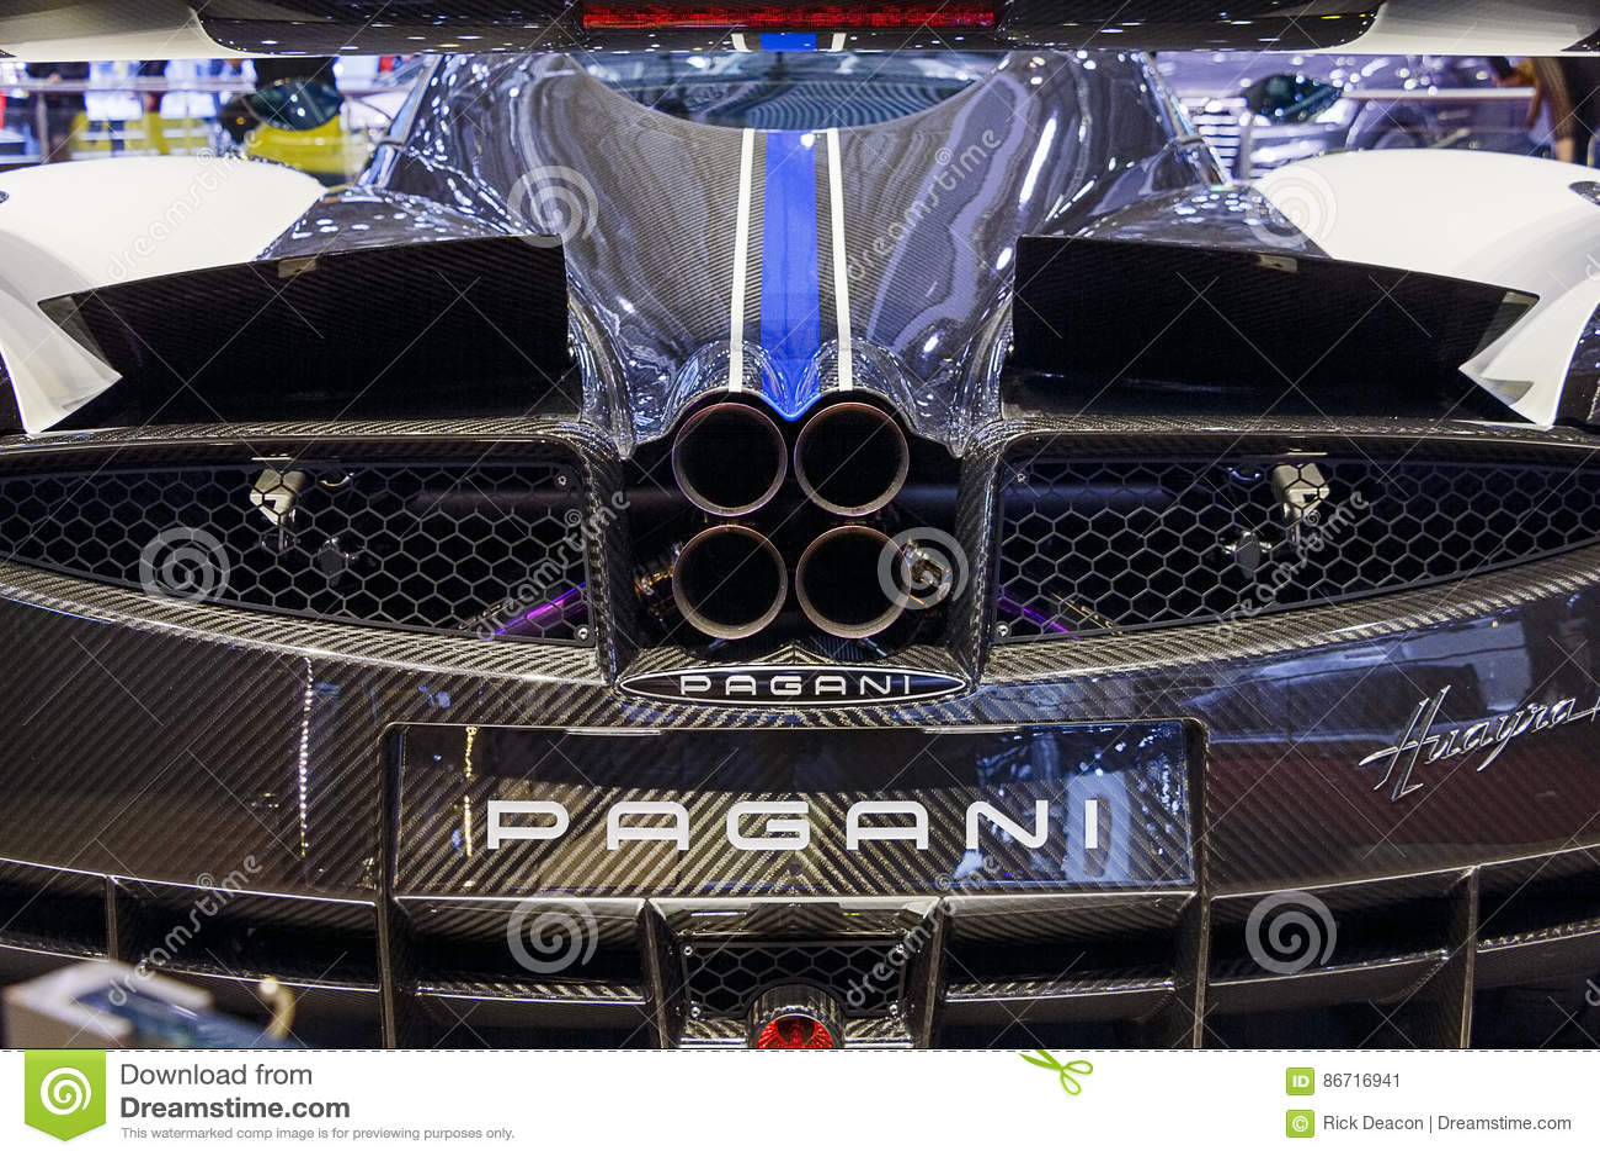 Pagani Zonda Exhaust Supercars Gallery